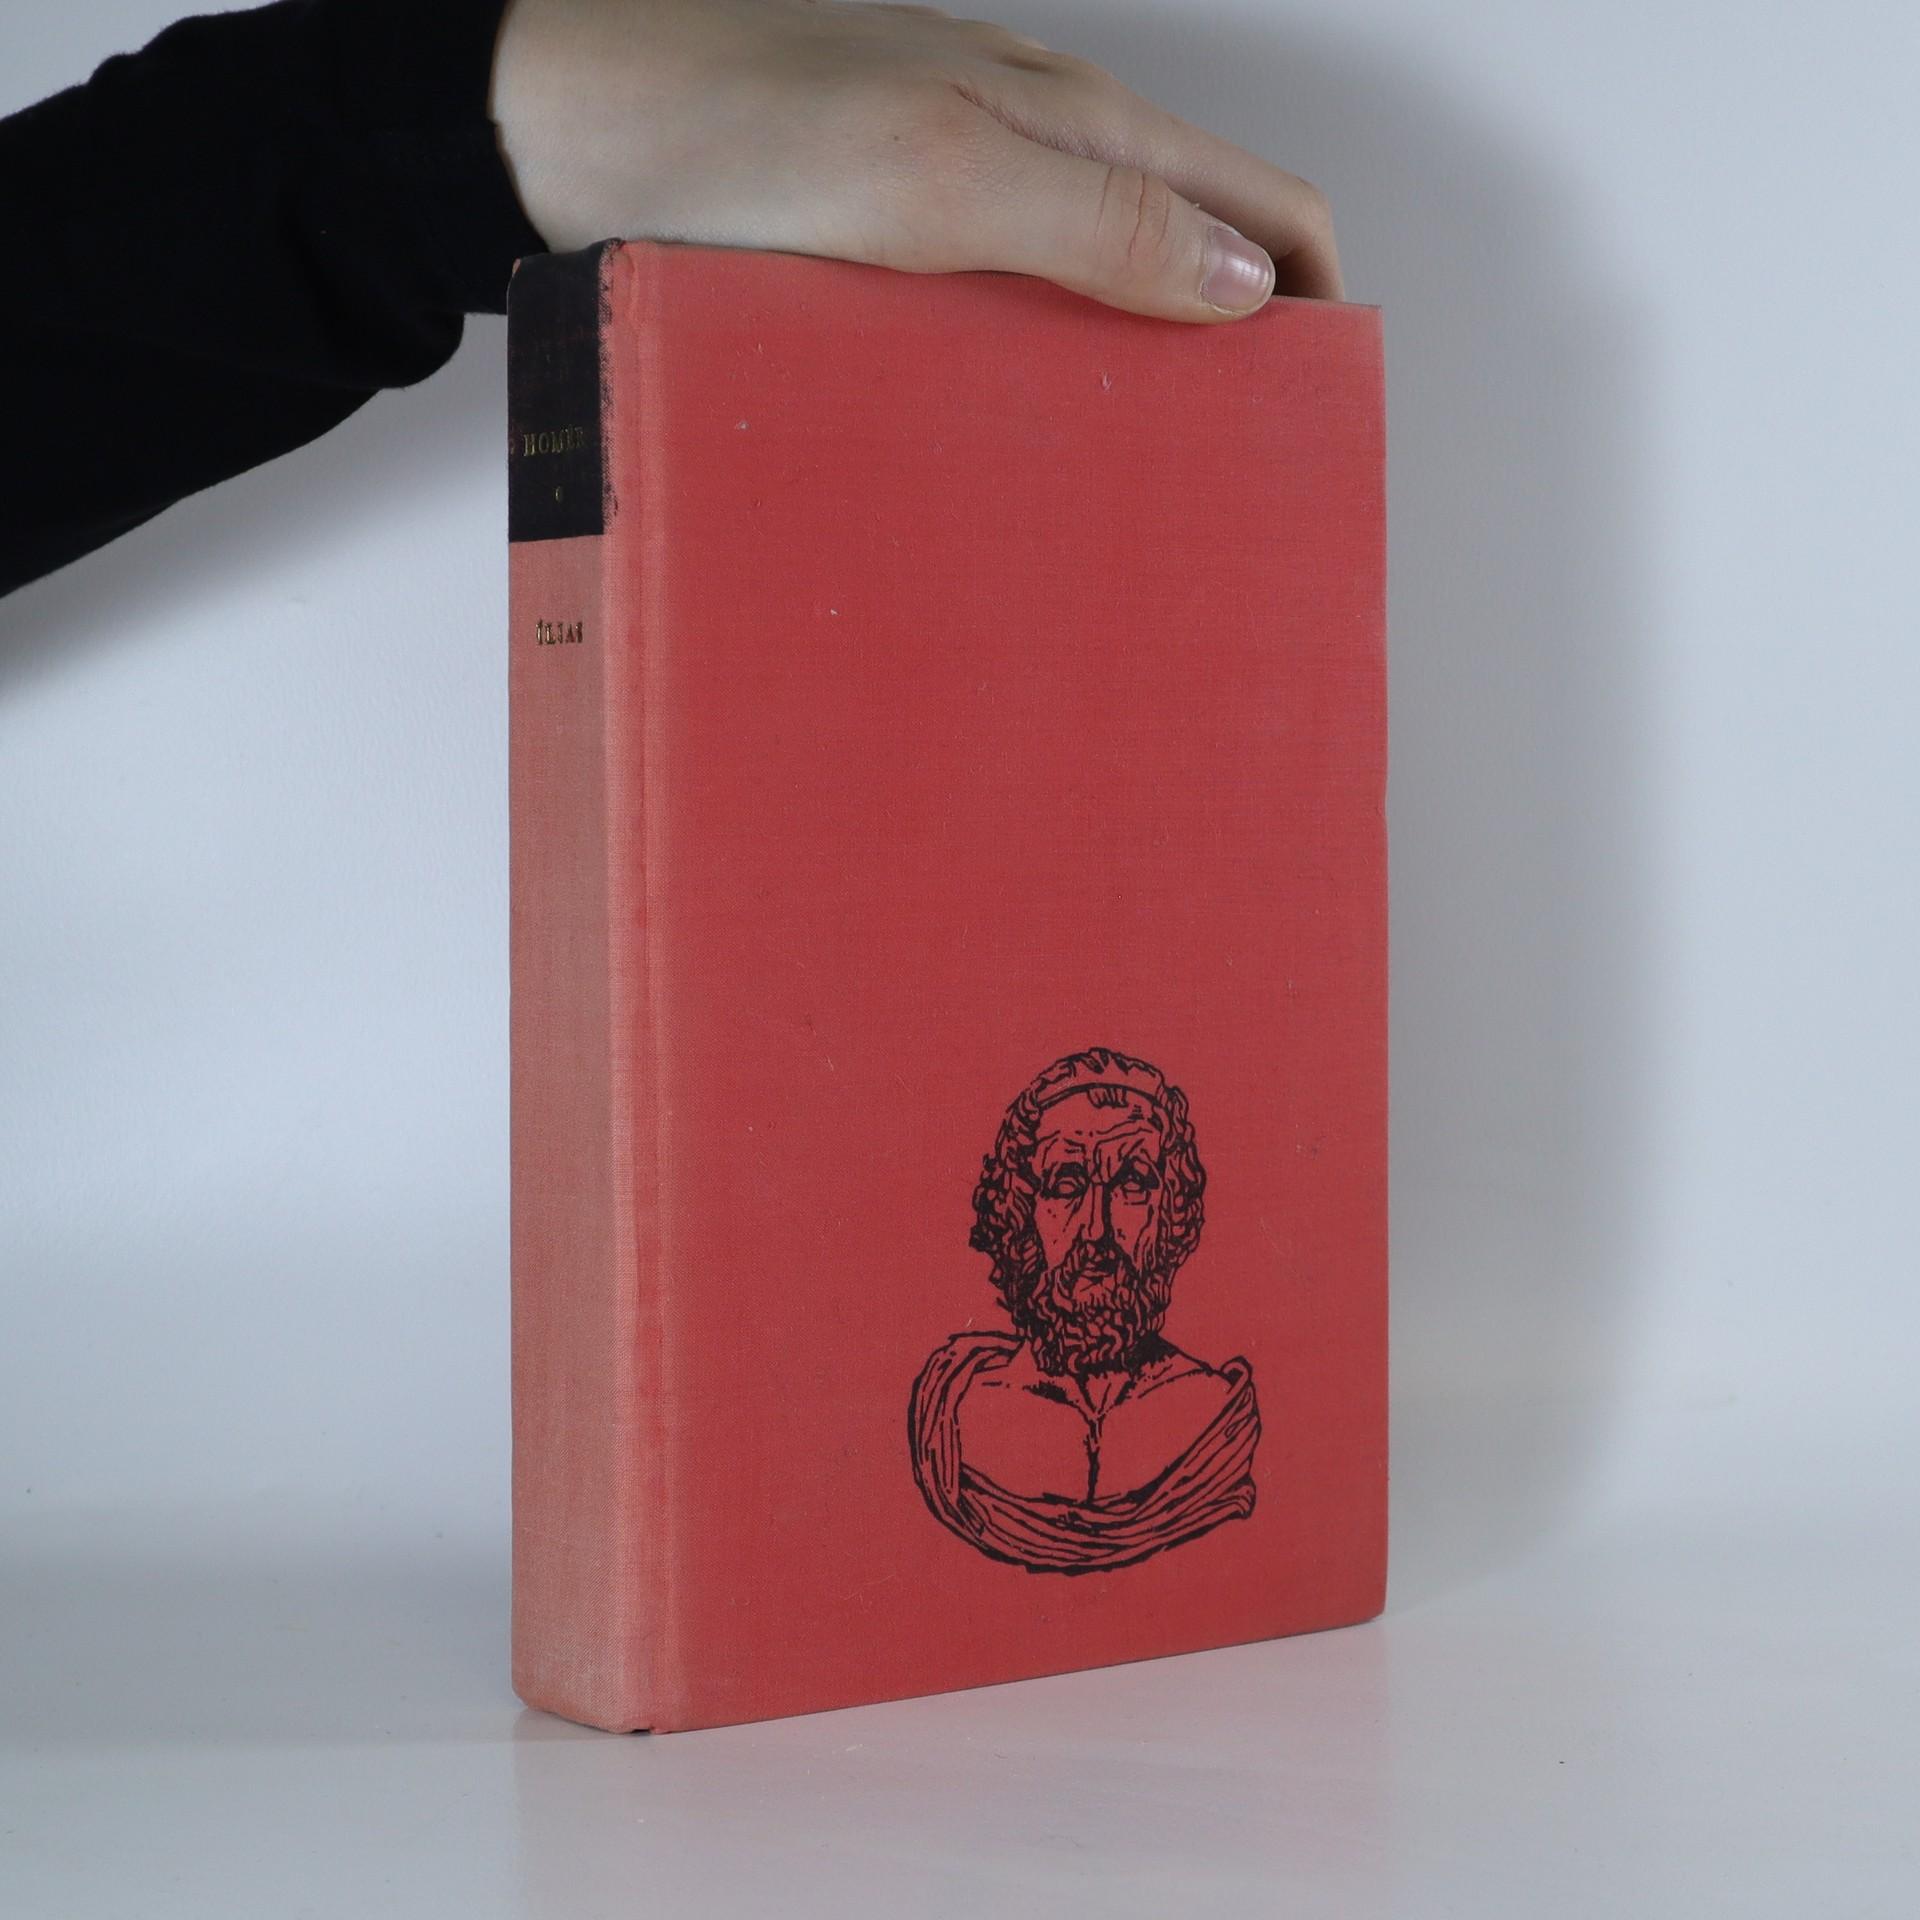 antikvární kniha Ílias, 1980